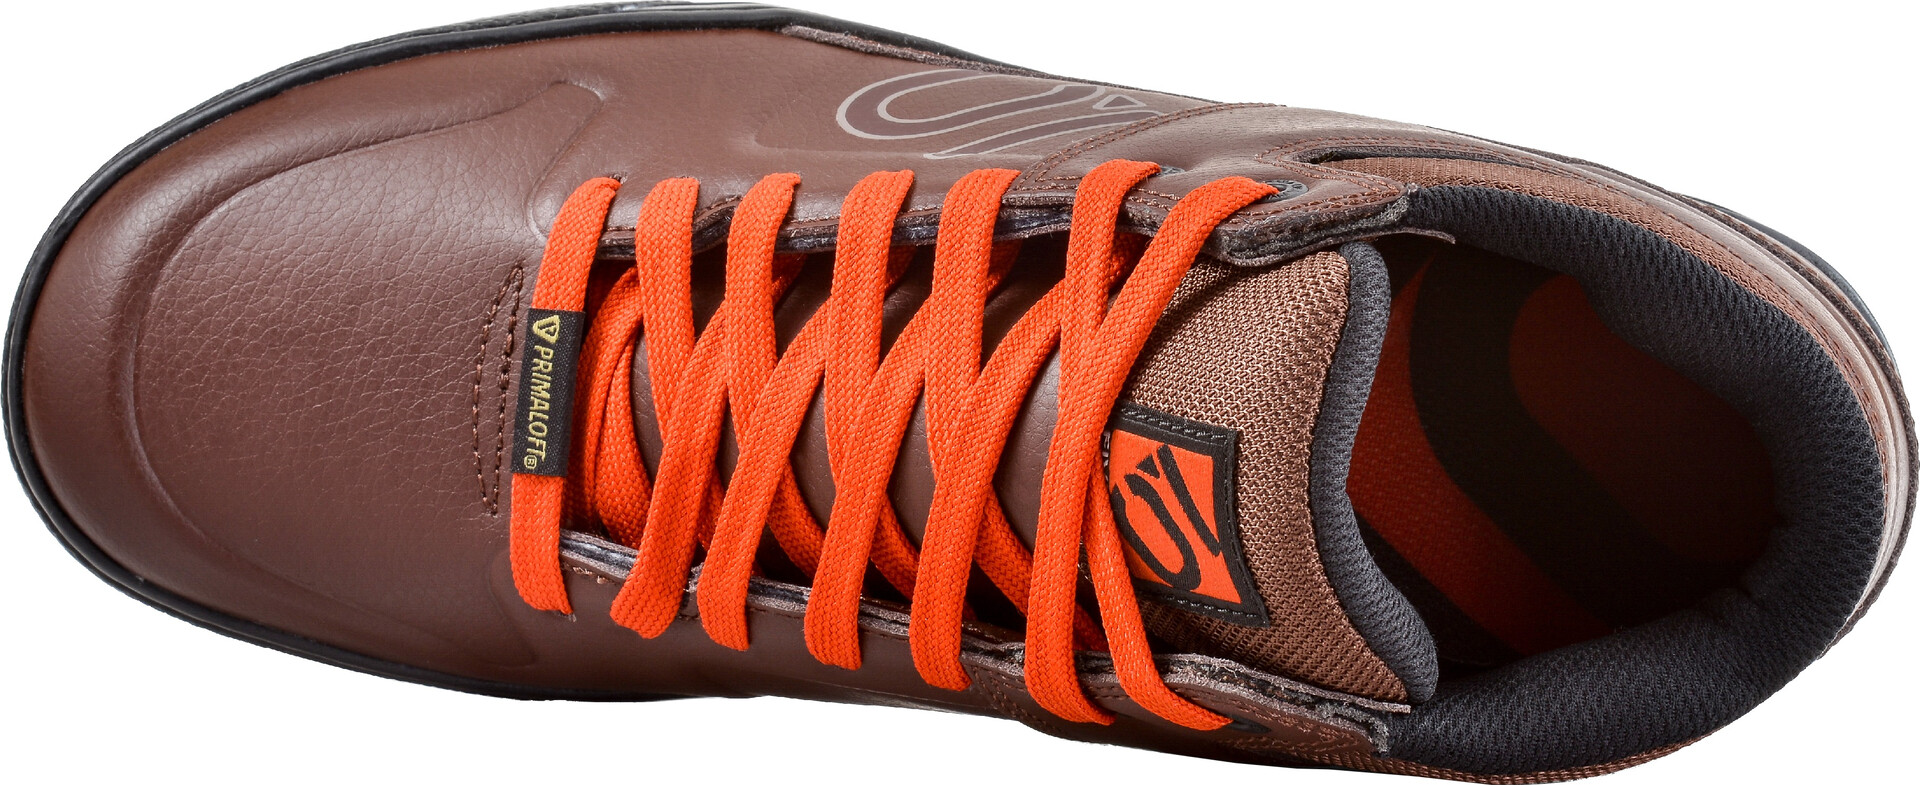 Chaussures Homme adidas Five Ten Freerider EPS Chaussures mi